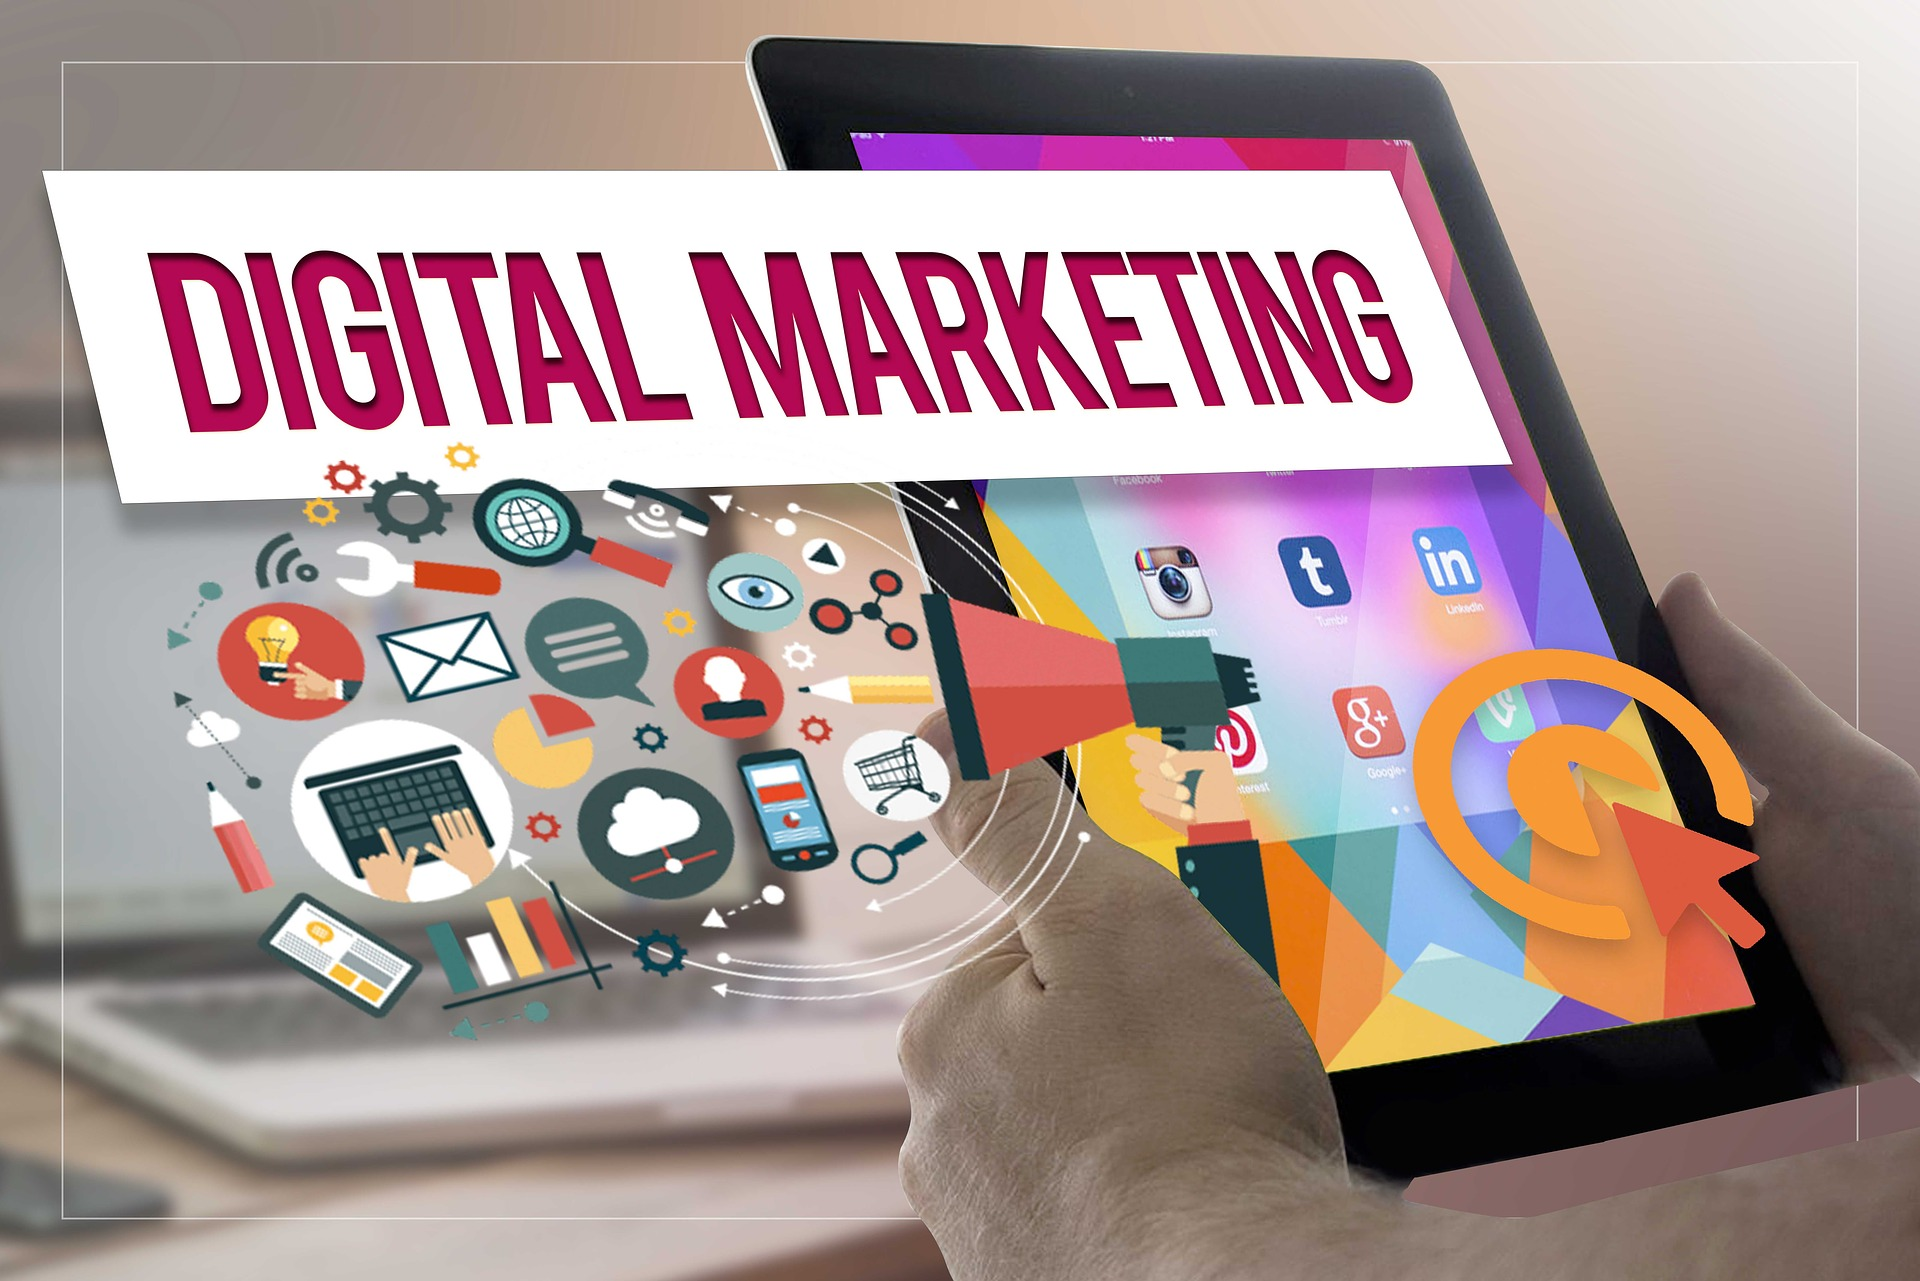 digital-marketing-4111002_1920